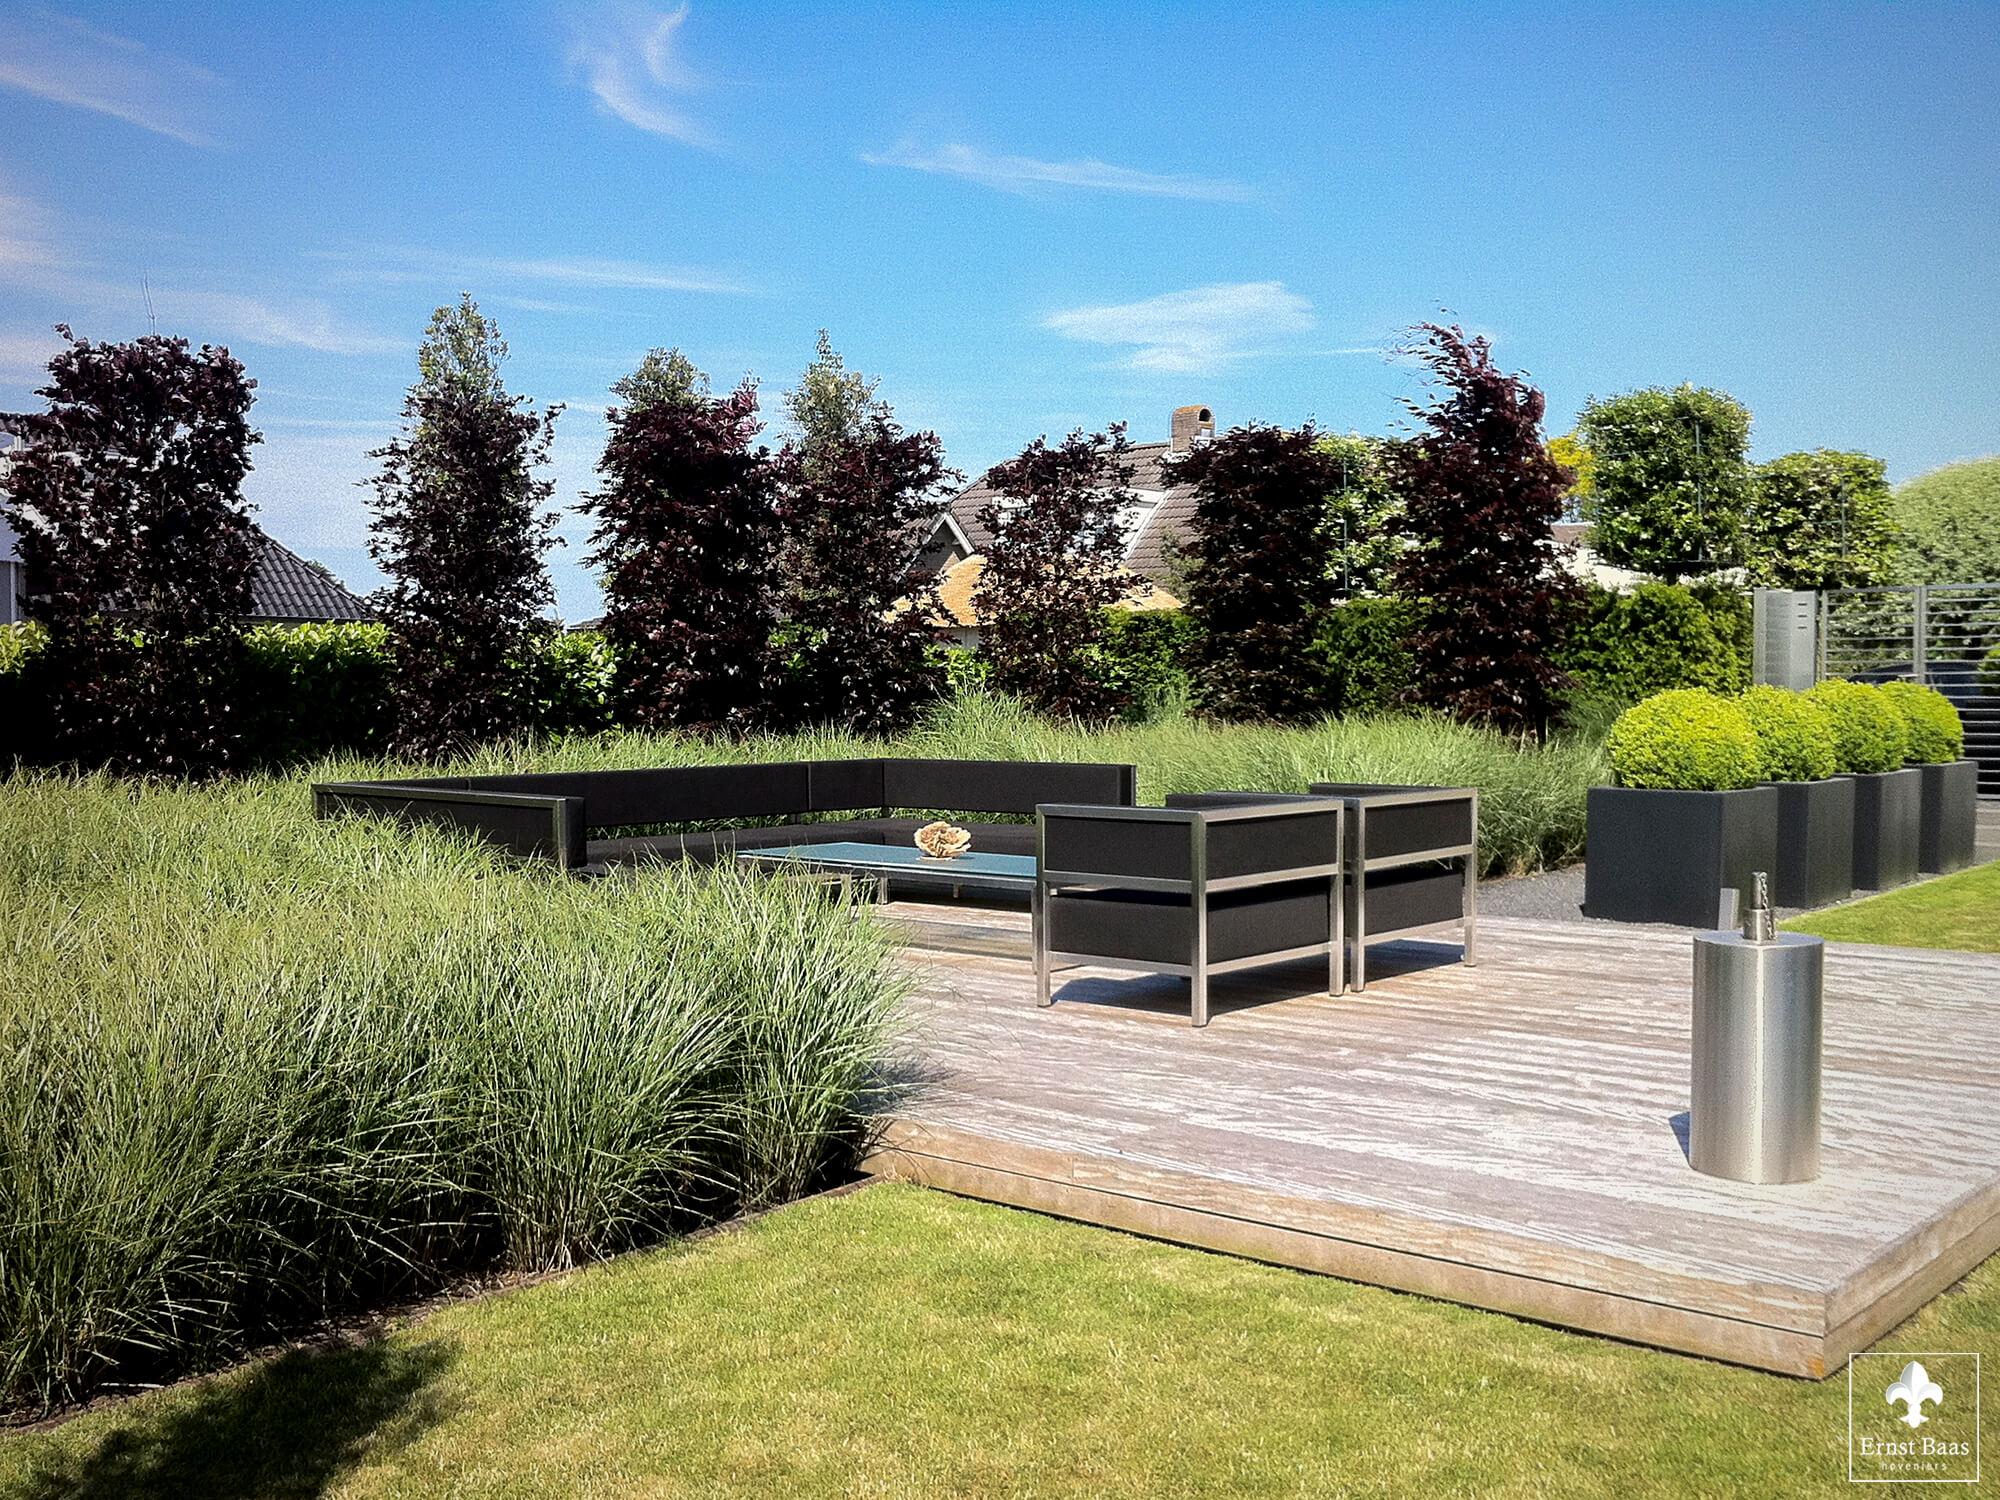 Moderne tuinen ernst baas hoveniersbedrijf in waddinxveen - Moderne hoek lounge ...